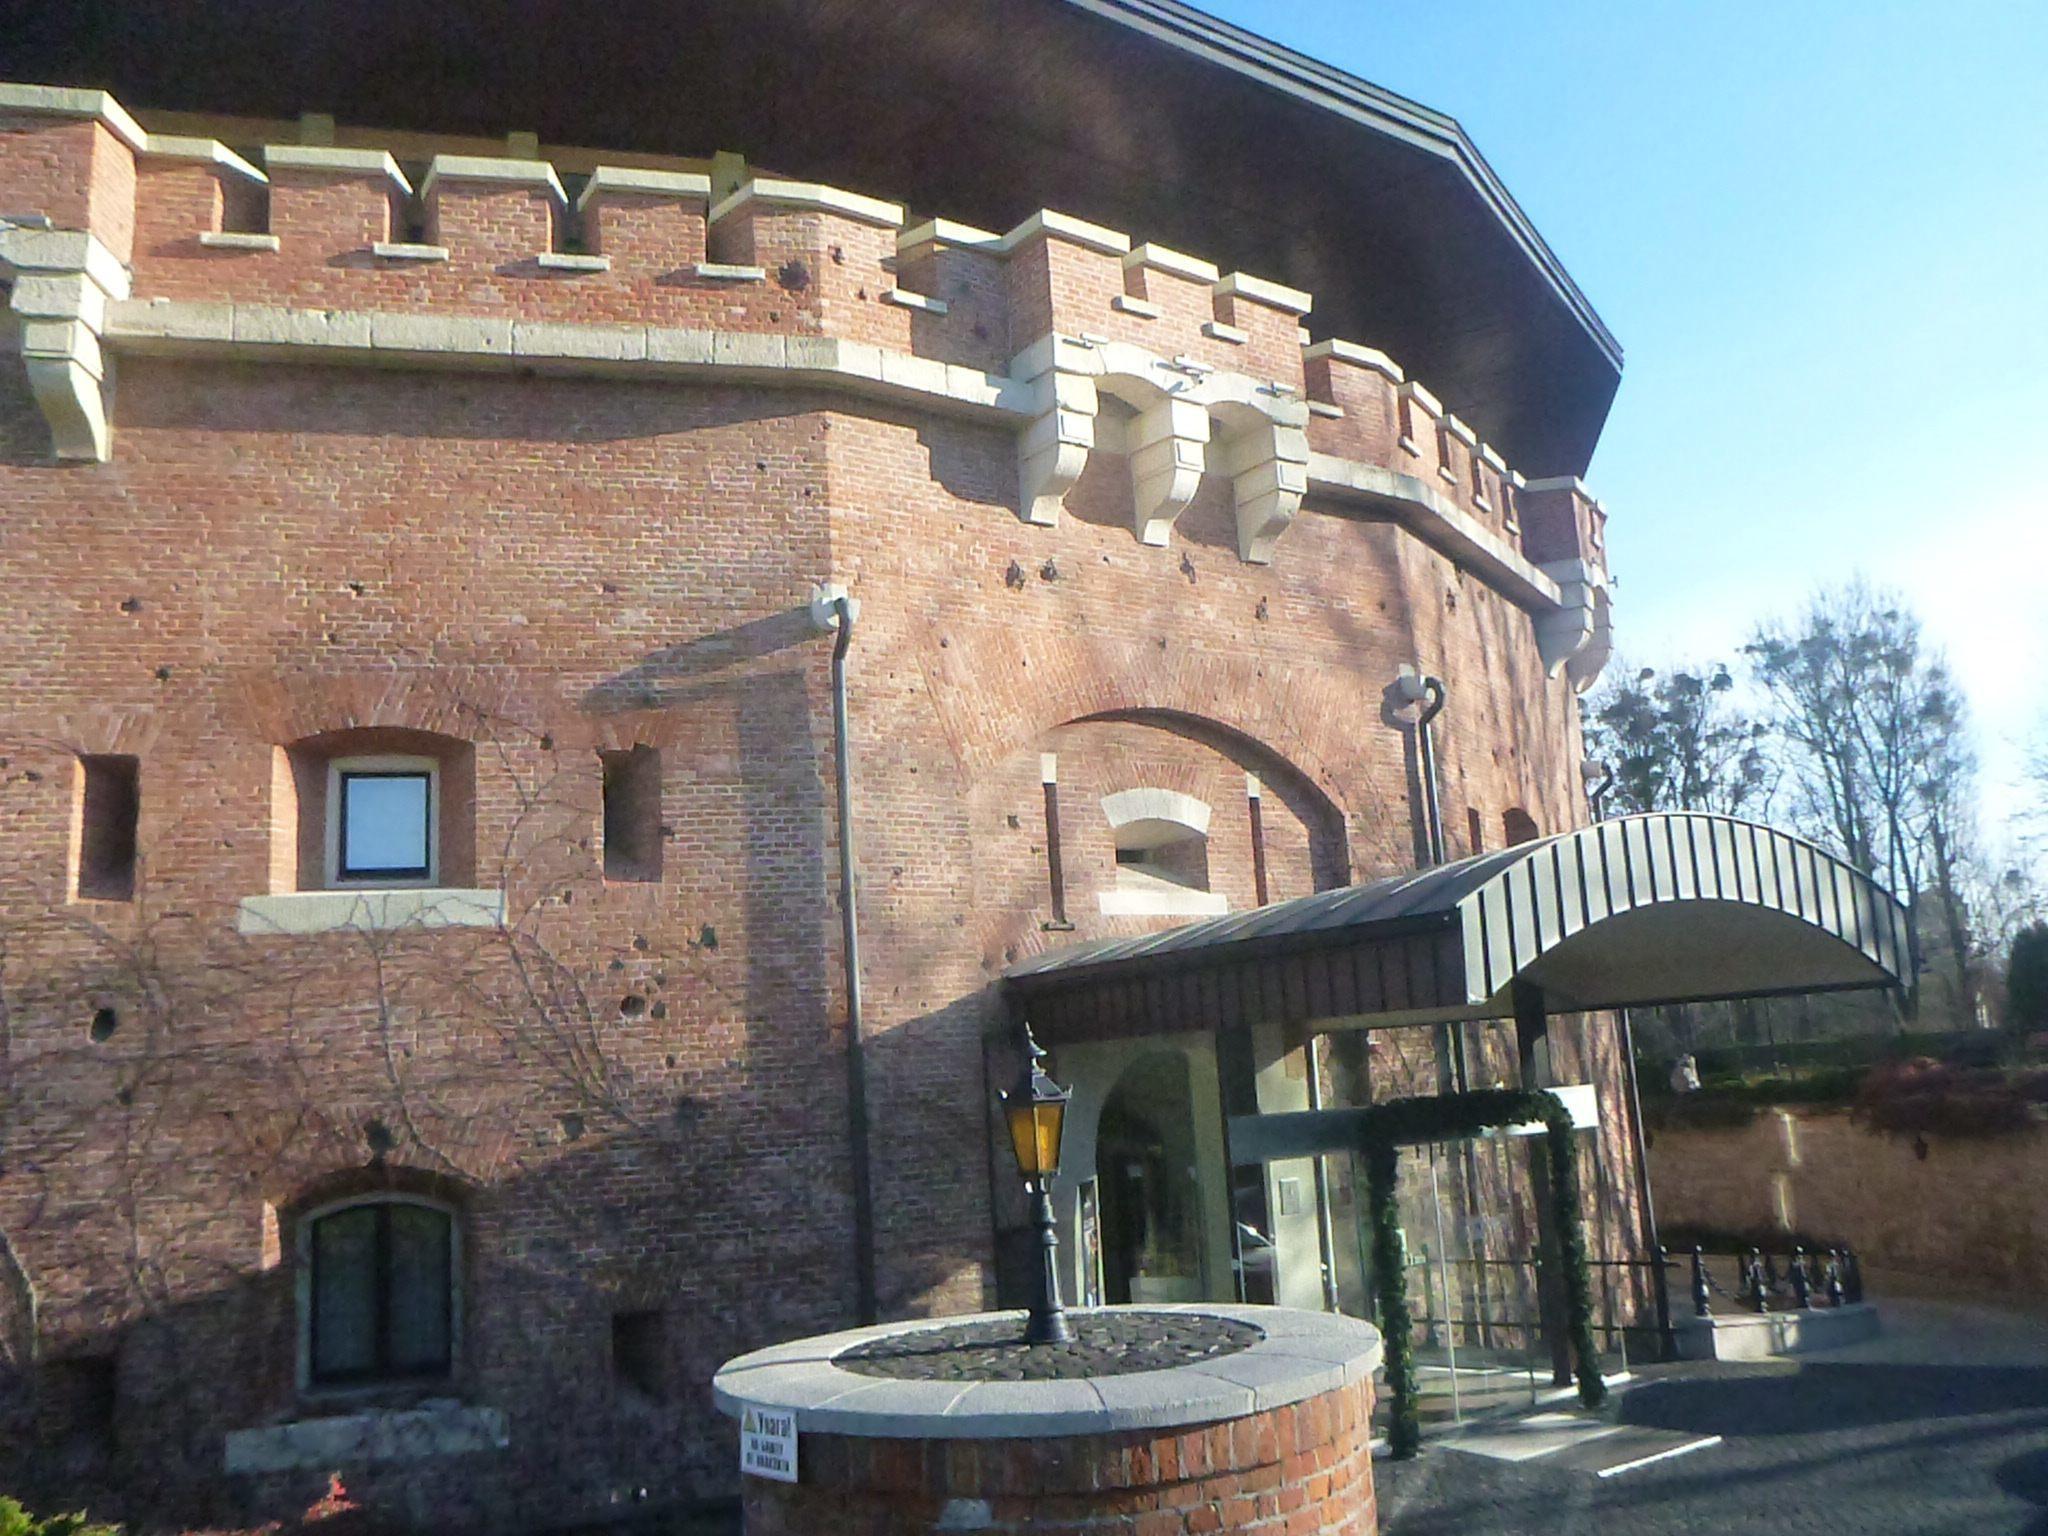 Staying at the fantastic Citadel Inn in Lviv, Ukraine